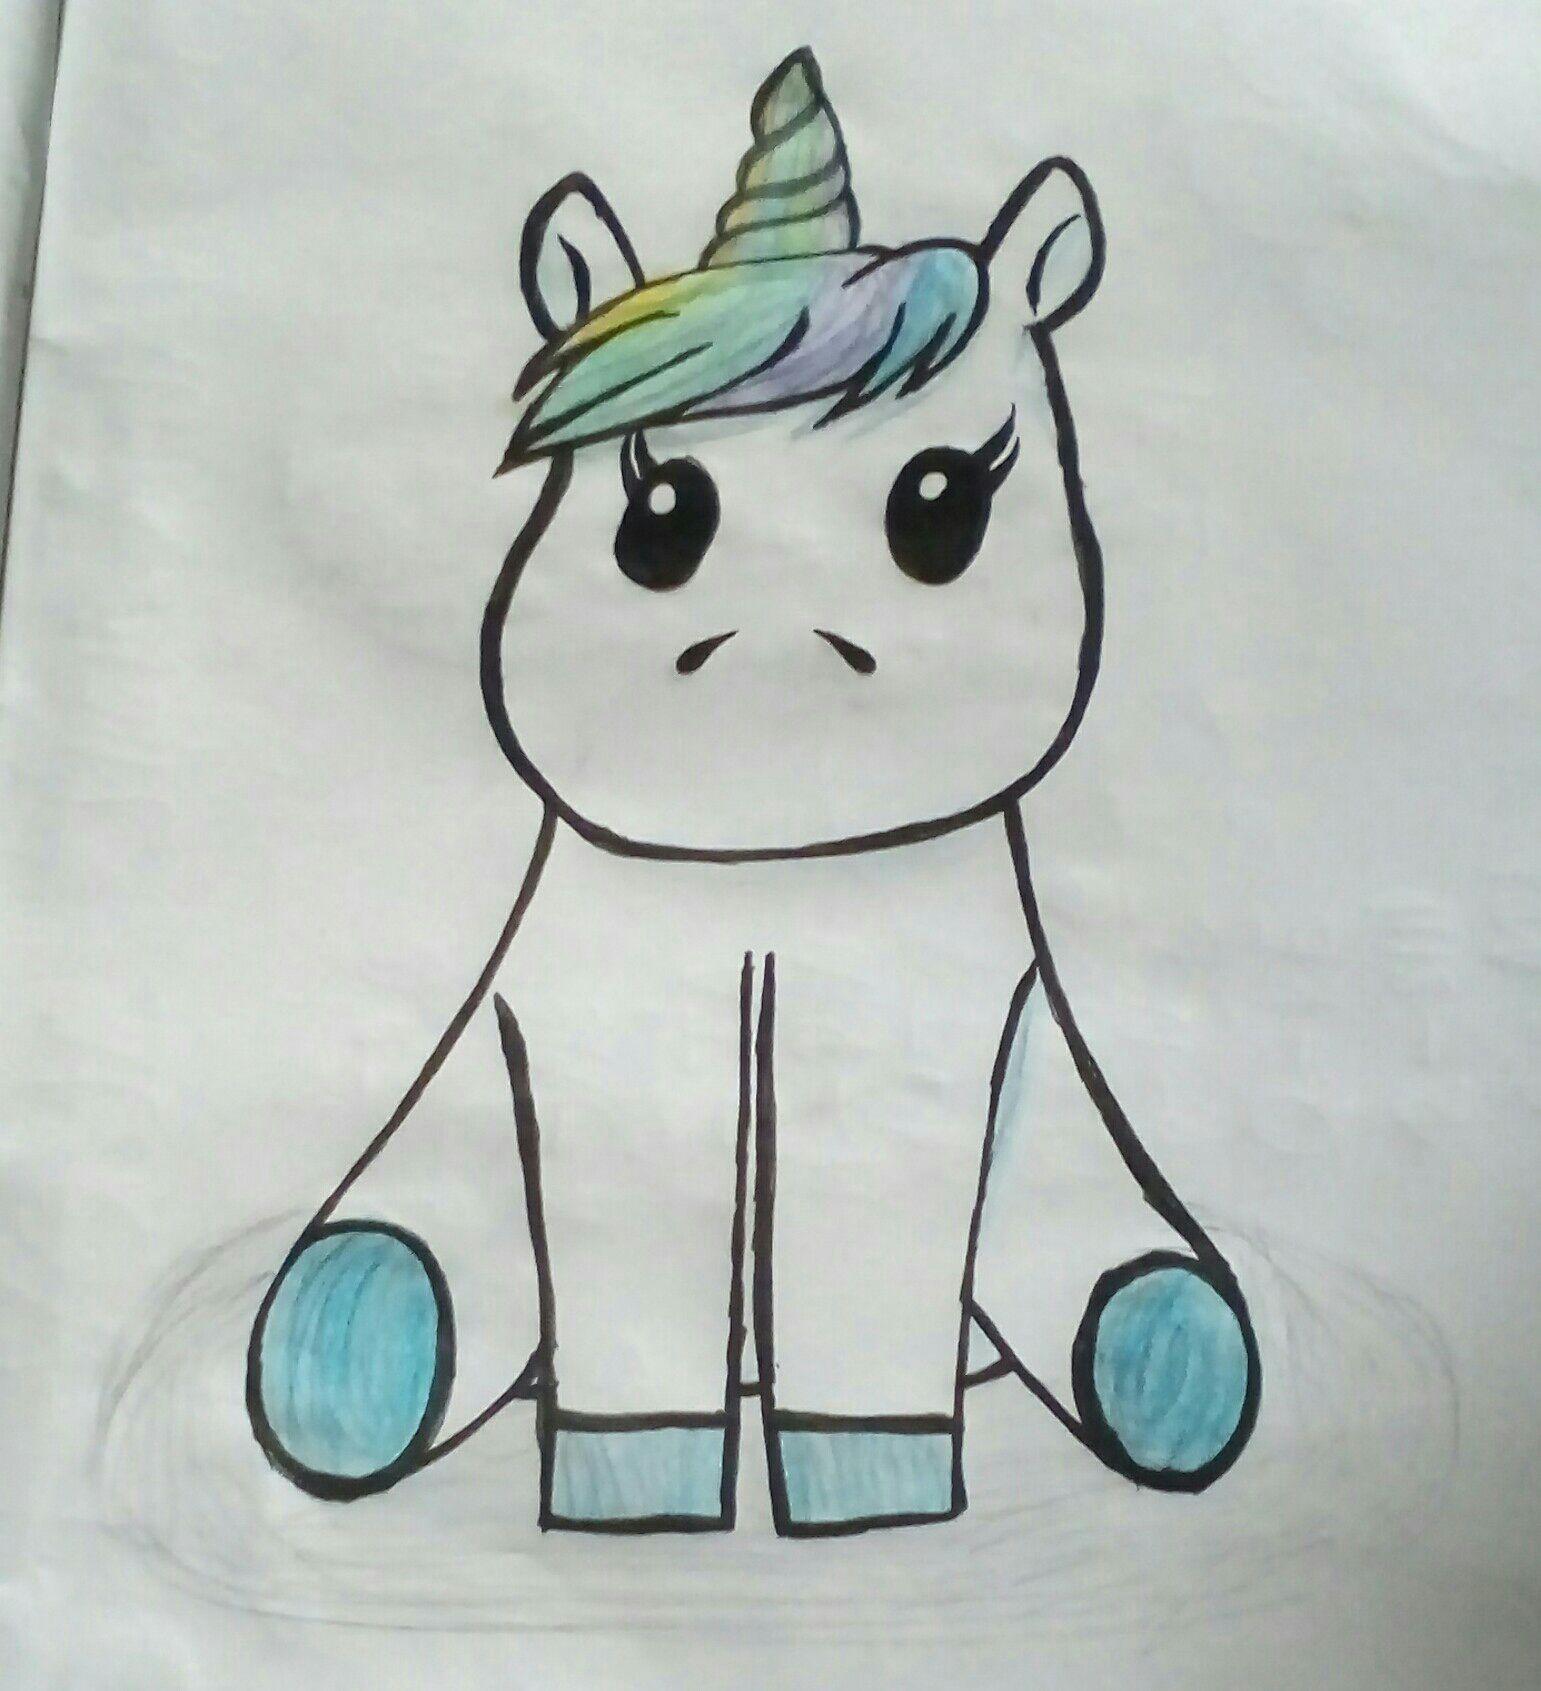 Me Obrazky Pozastaveno Unicorn Jednorozec Wattpad